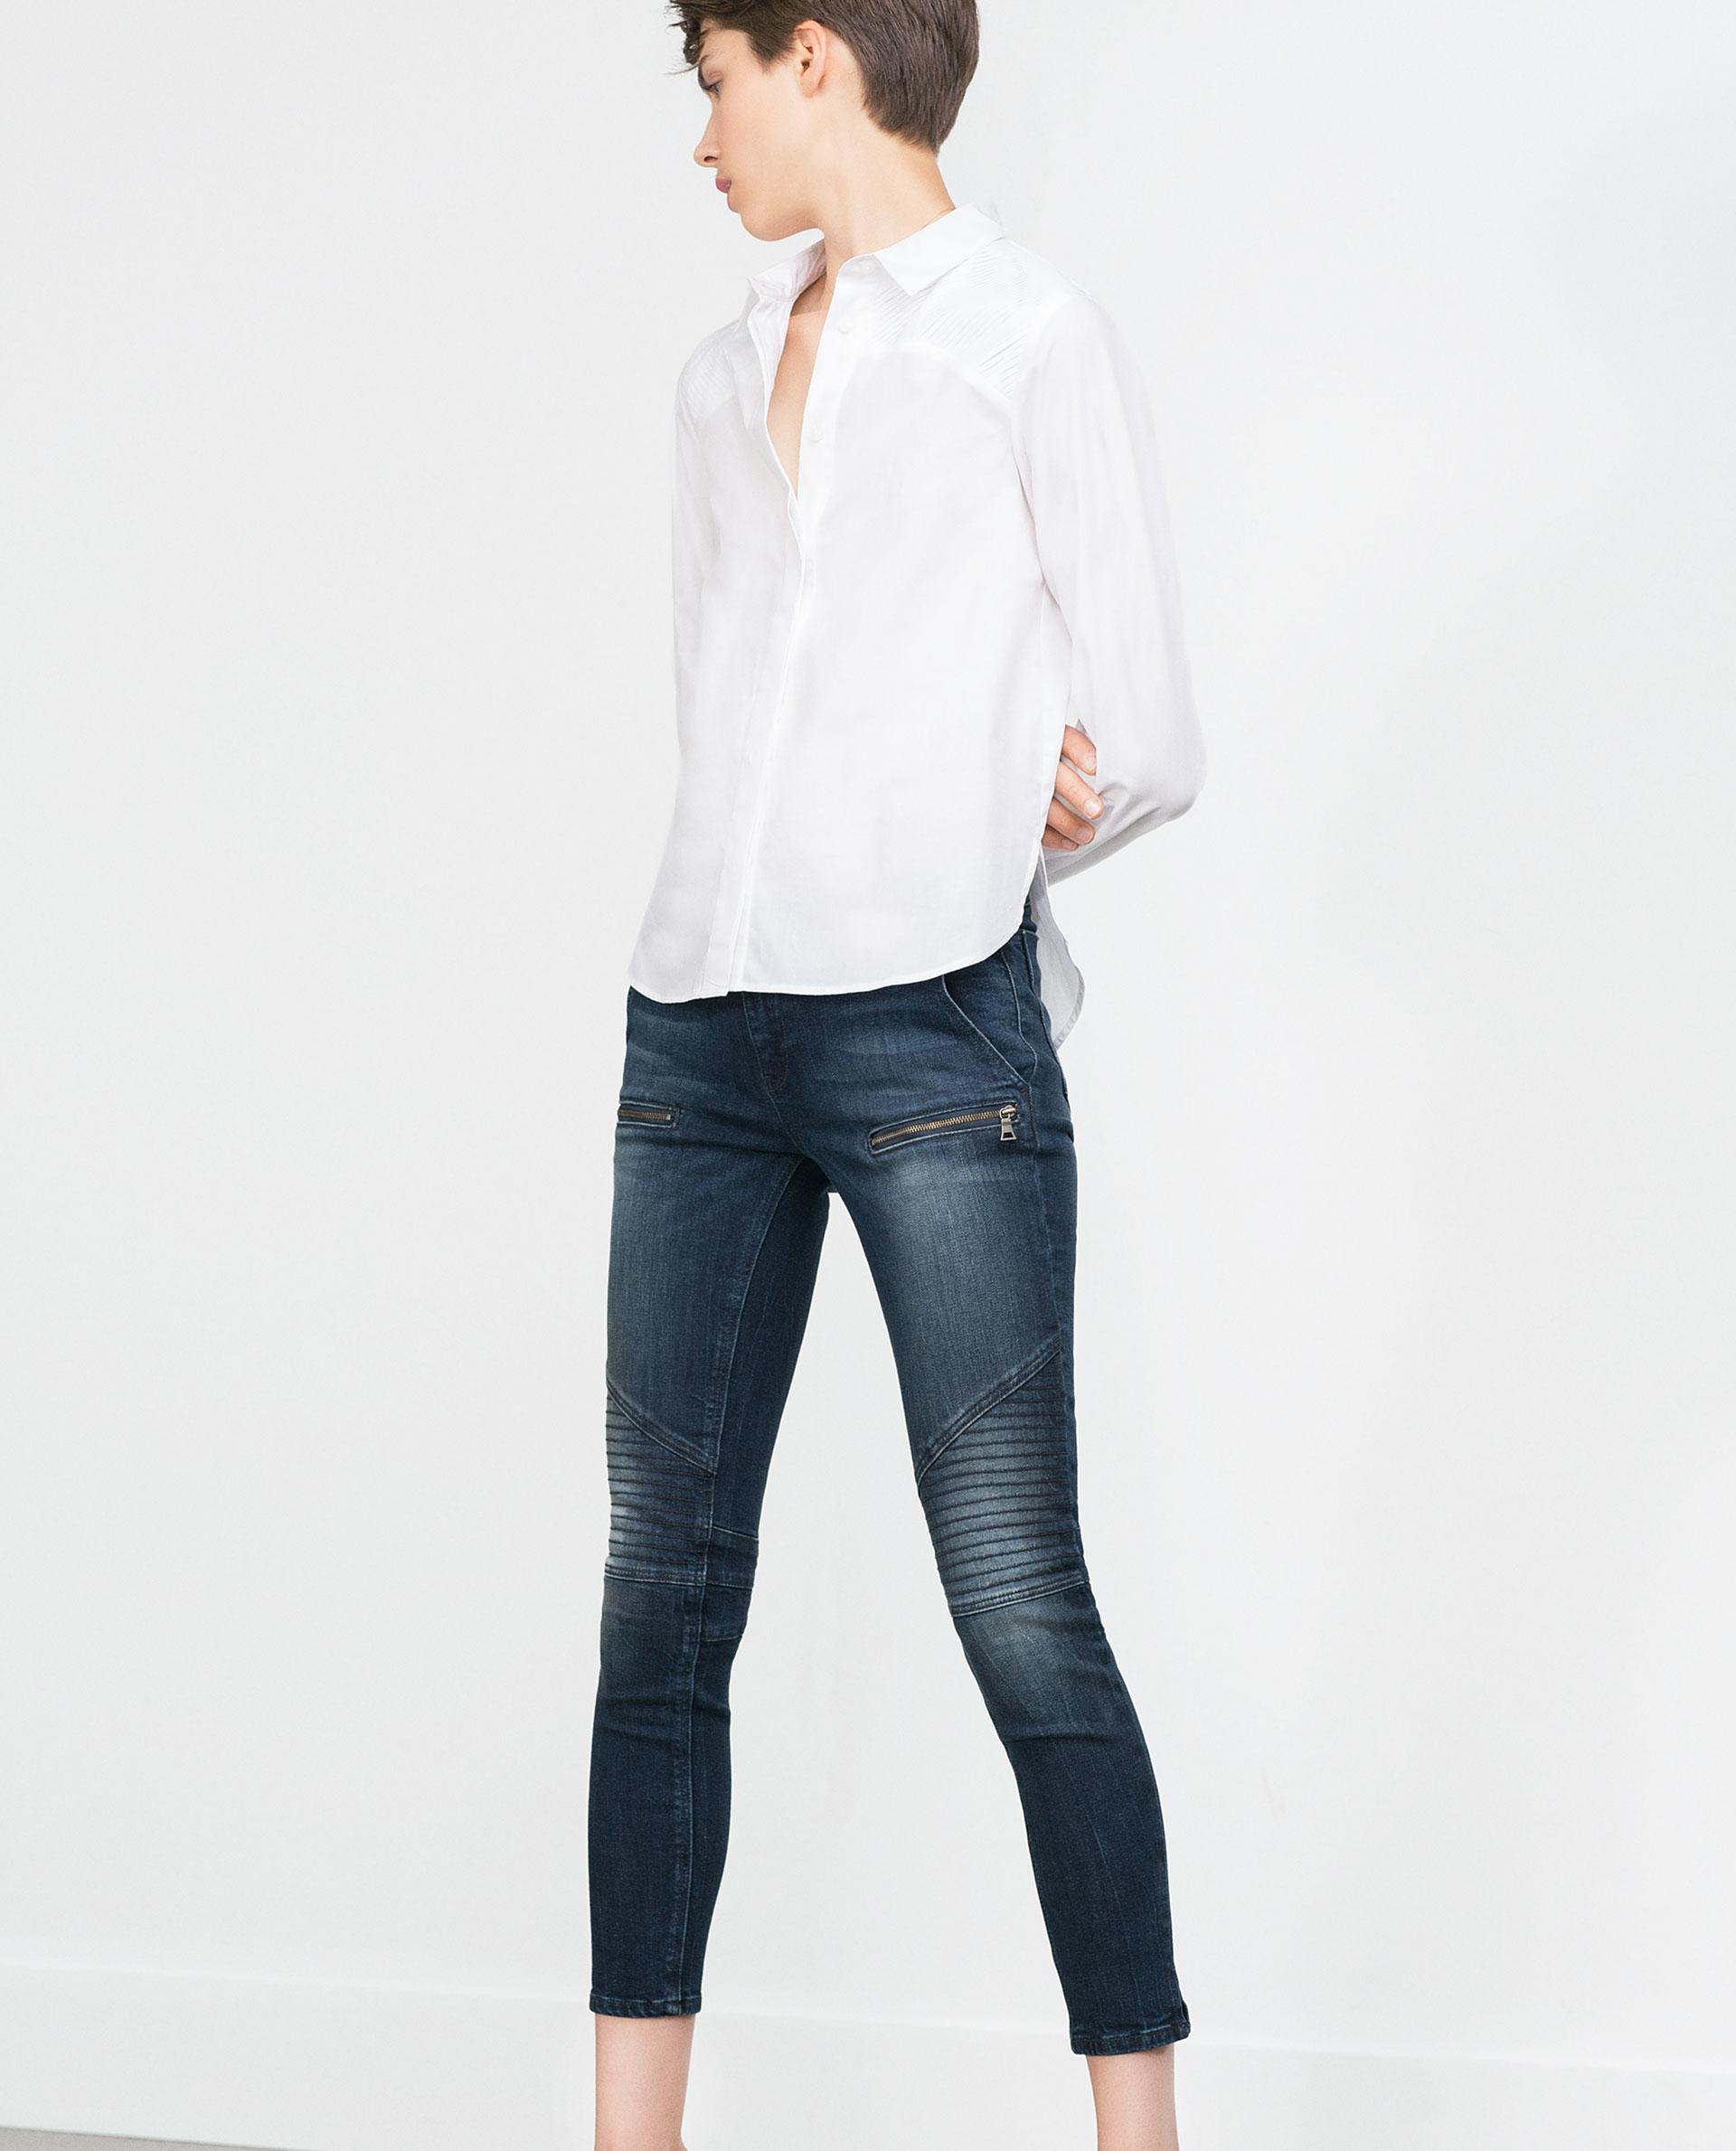 Excellent Zara Spring 2015 Women Lookbook Doublebreasted Coat Amp Flared Jeans